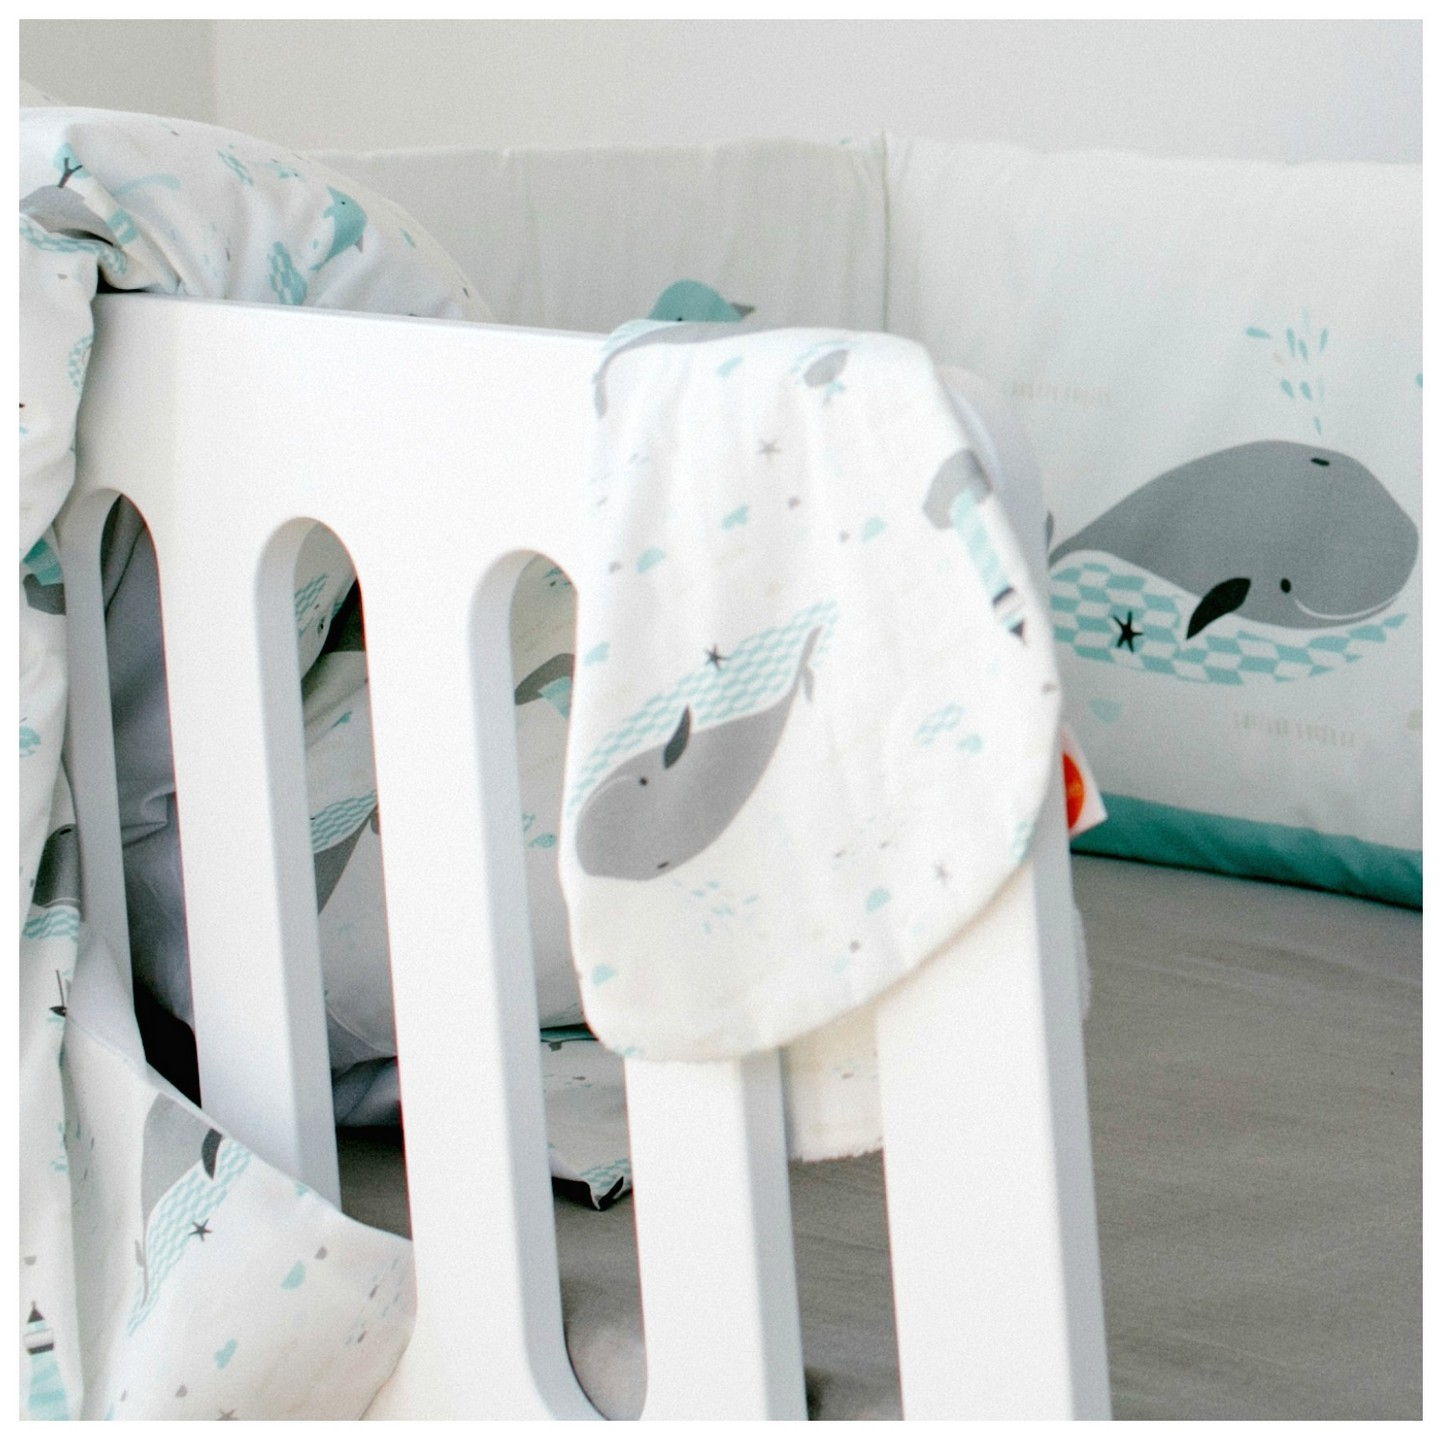 millemarille spucktuch save the whales stoffwindel. Black Bedroom Furniture Sets. Home Design Ideas